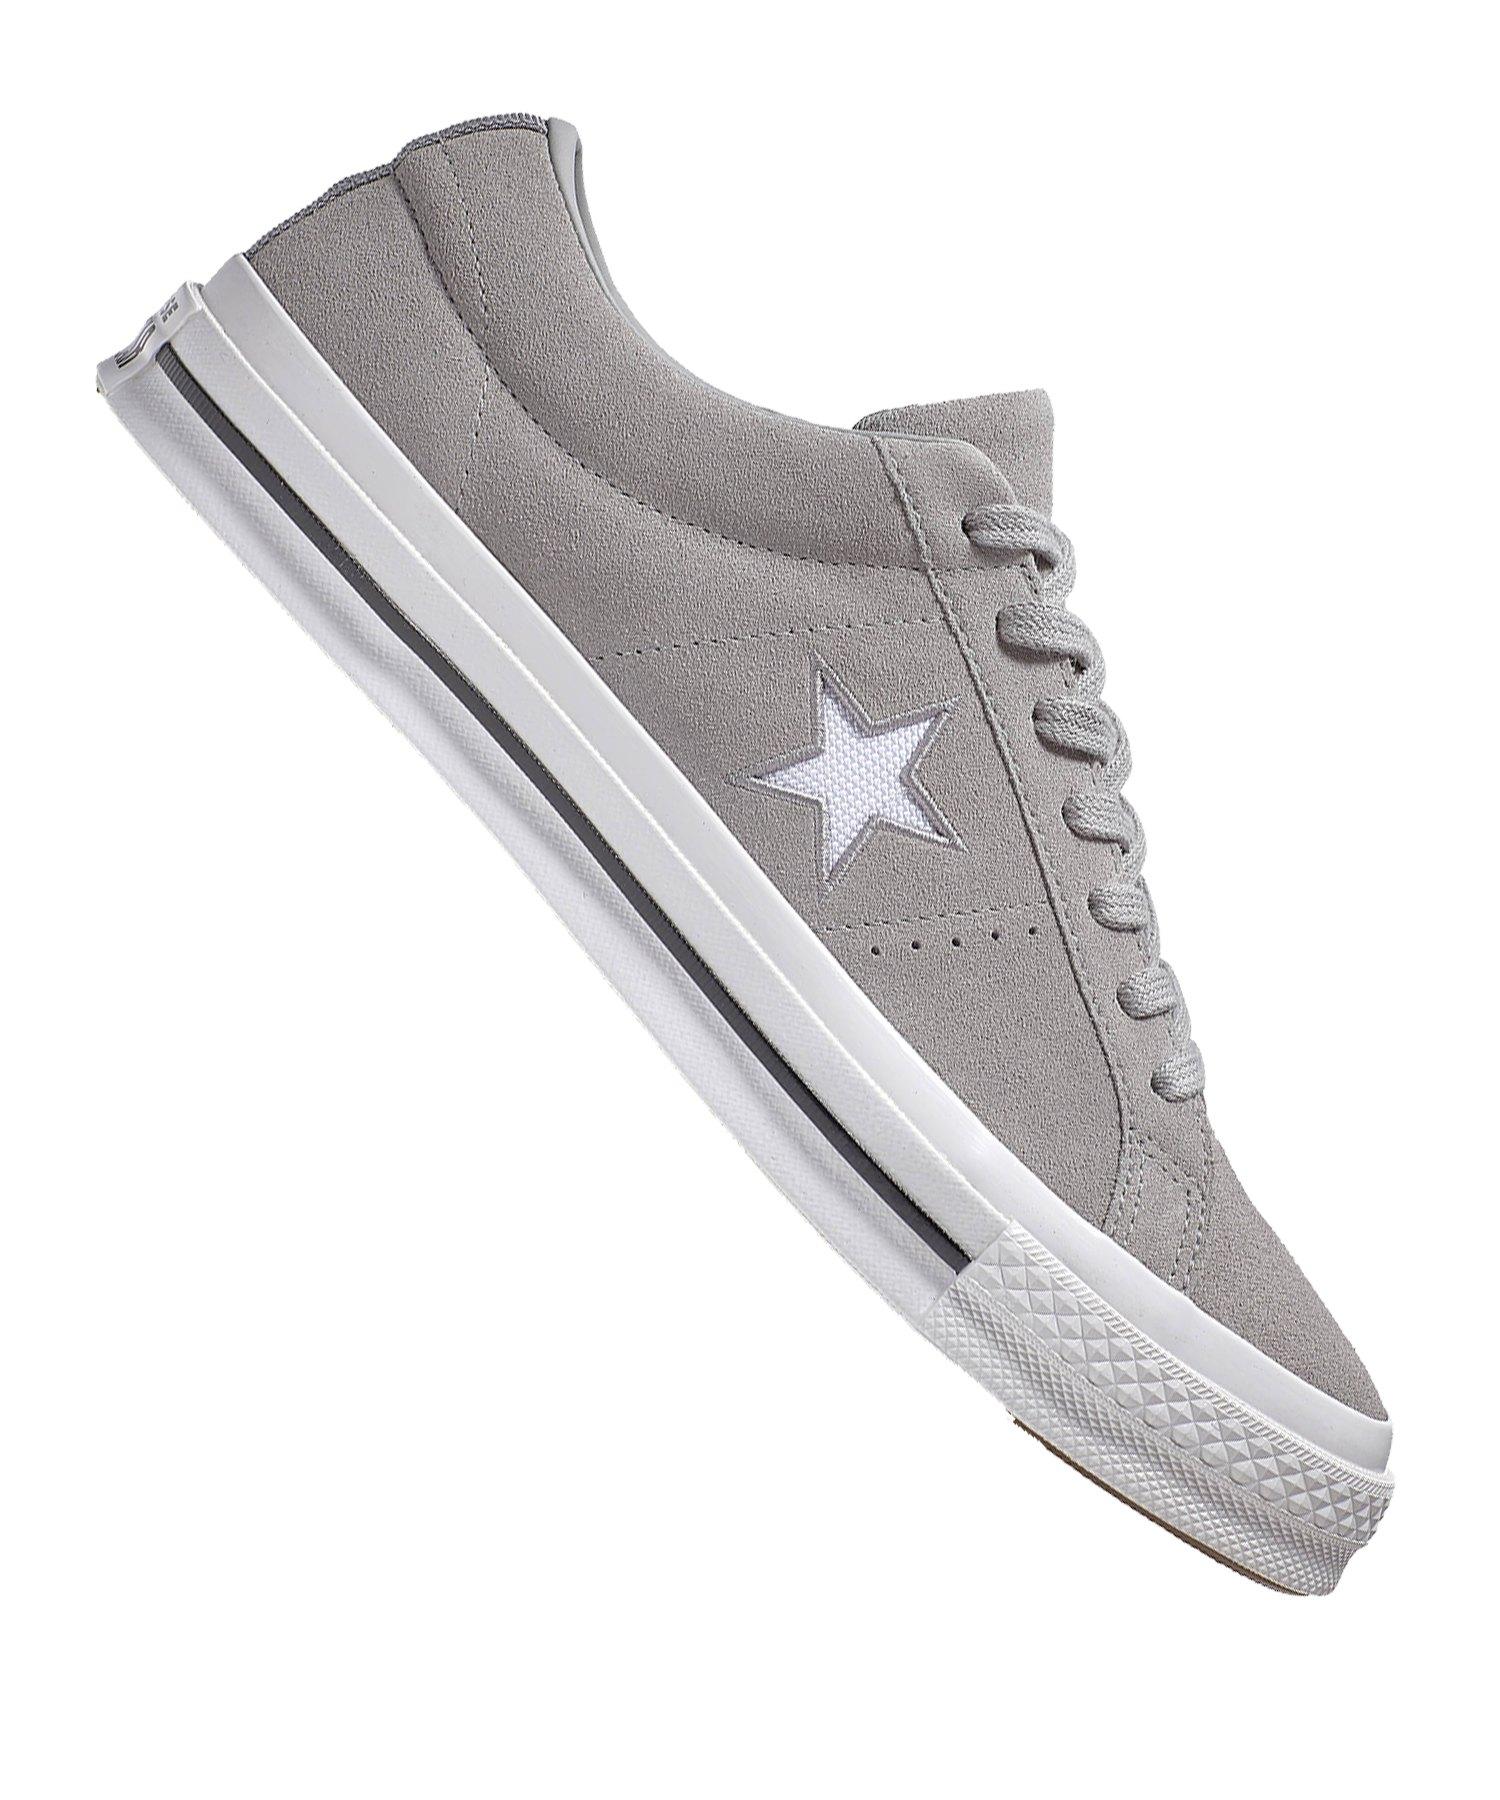 39316c937ec19 ... best converse one star ox sneaker grau f020 grau abdb5 7eecc